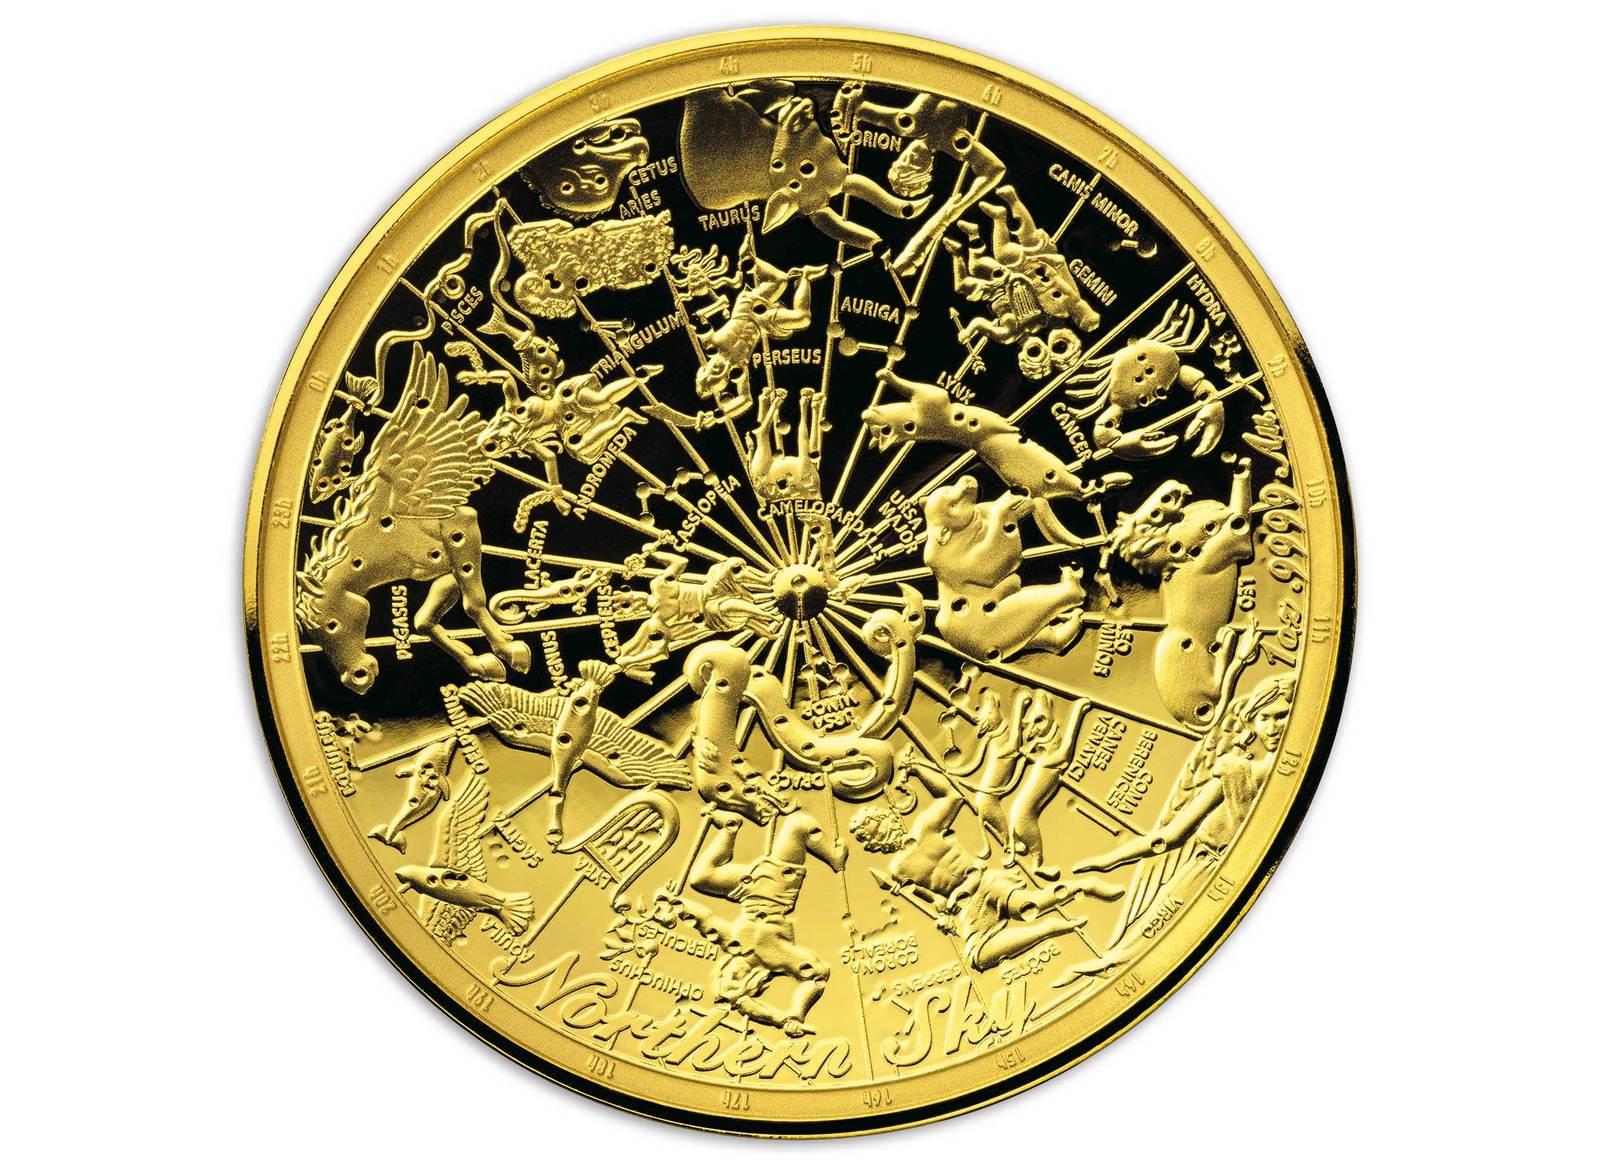 Coins Australia 2017 Celestial Dome Northern Sky Gold Coin